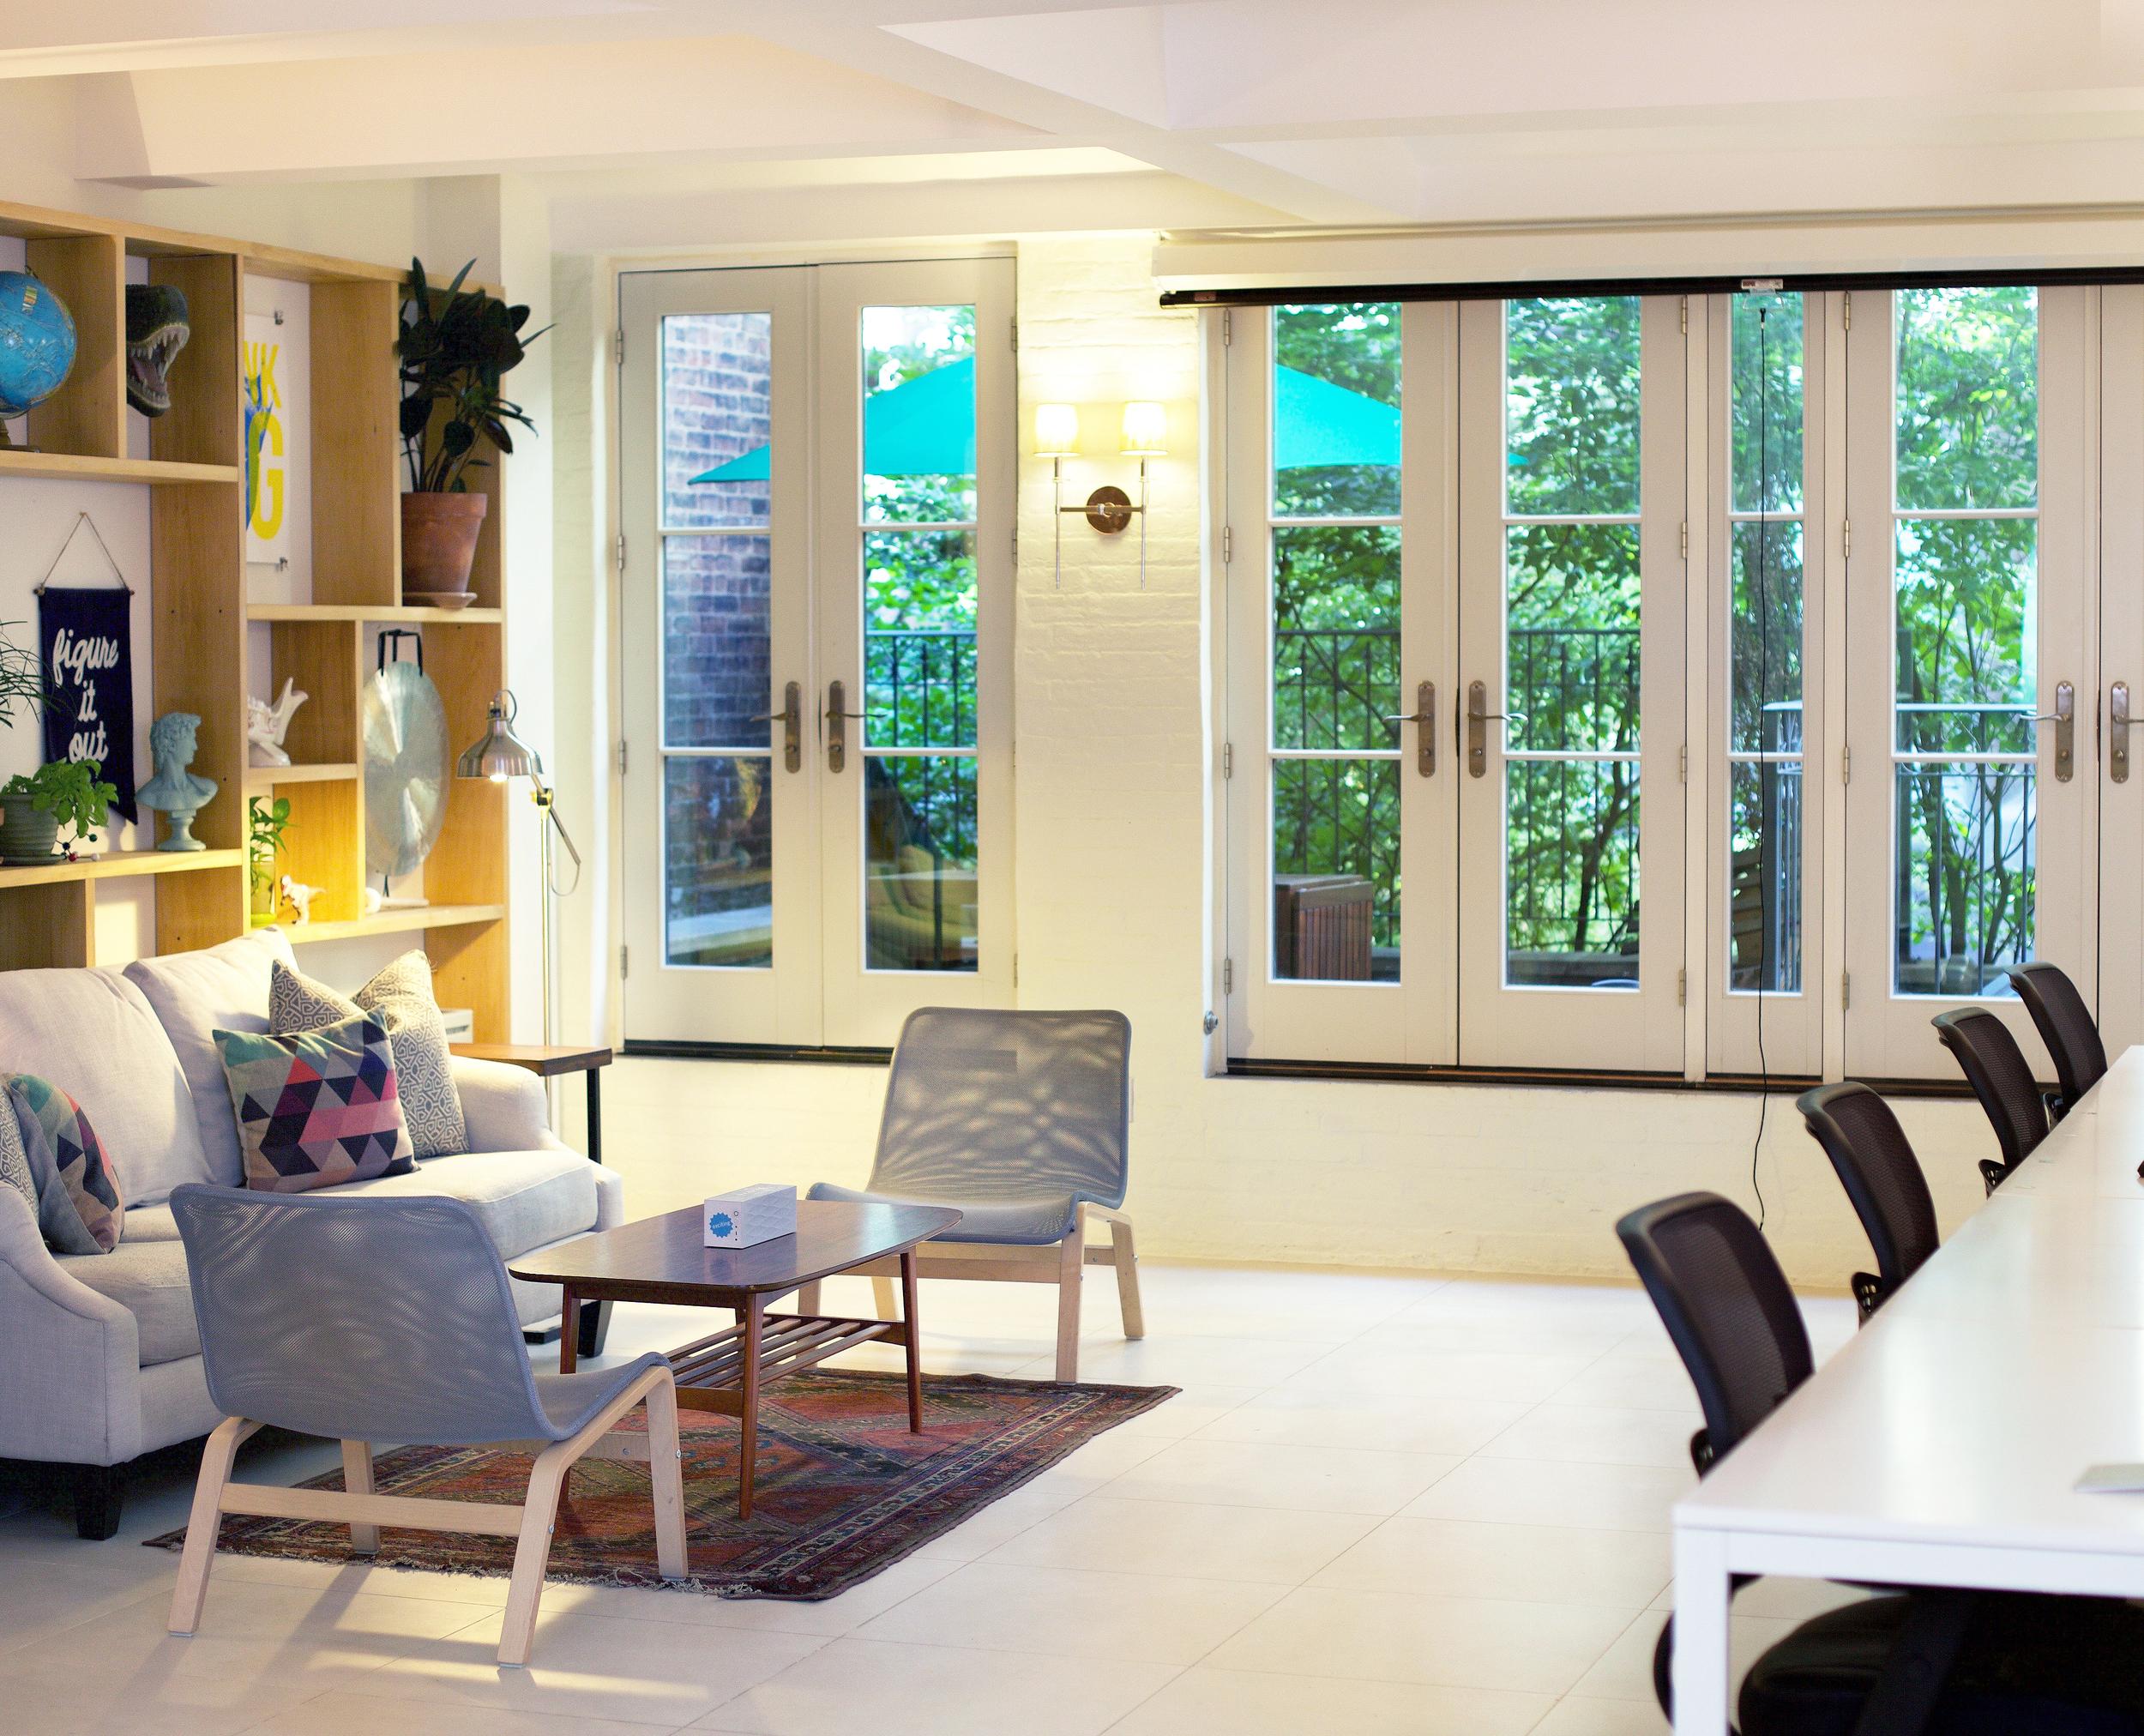 zmaic-one-month-interior-design-main-room-layout.jpg